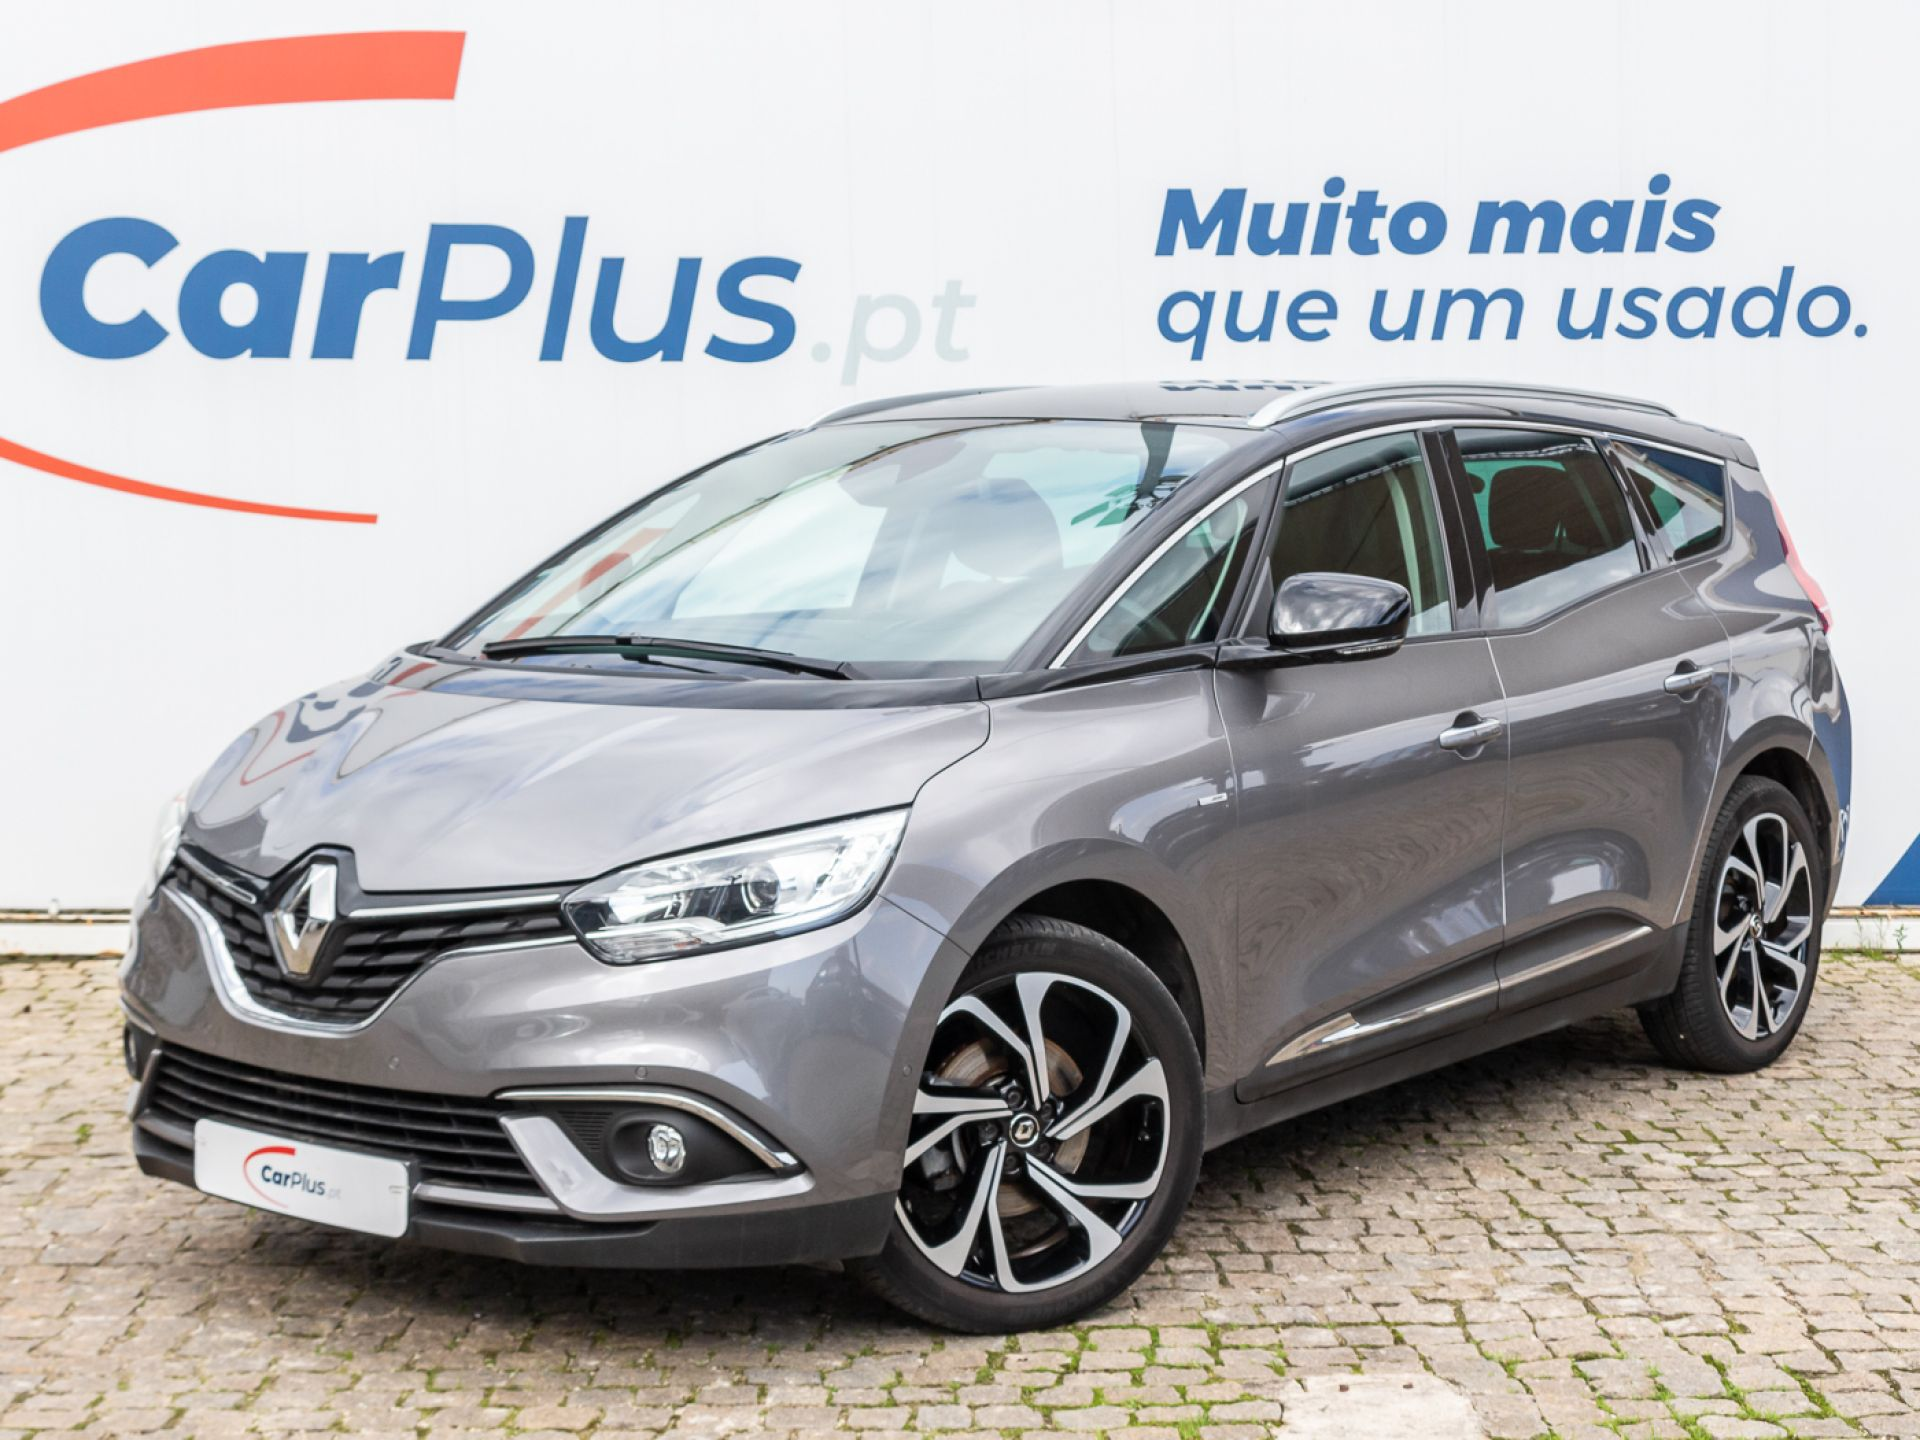 Renault Grand Scenic 1.3 TCe 160 FAP Bose Edition segunda mão Lisboa